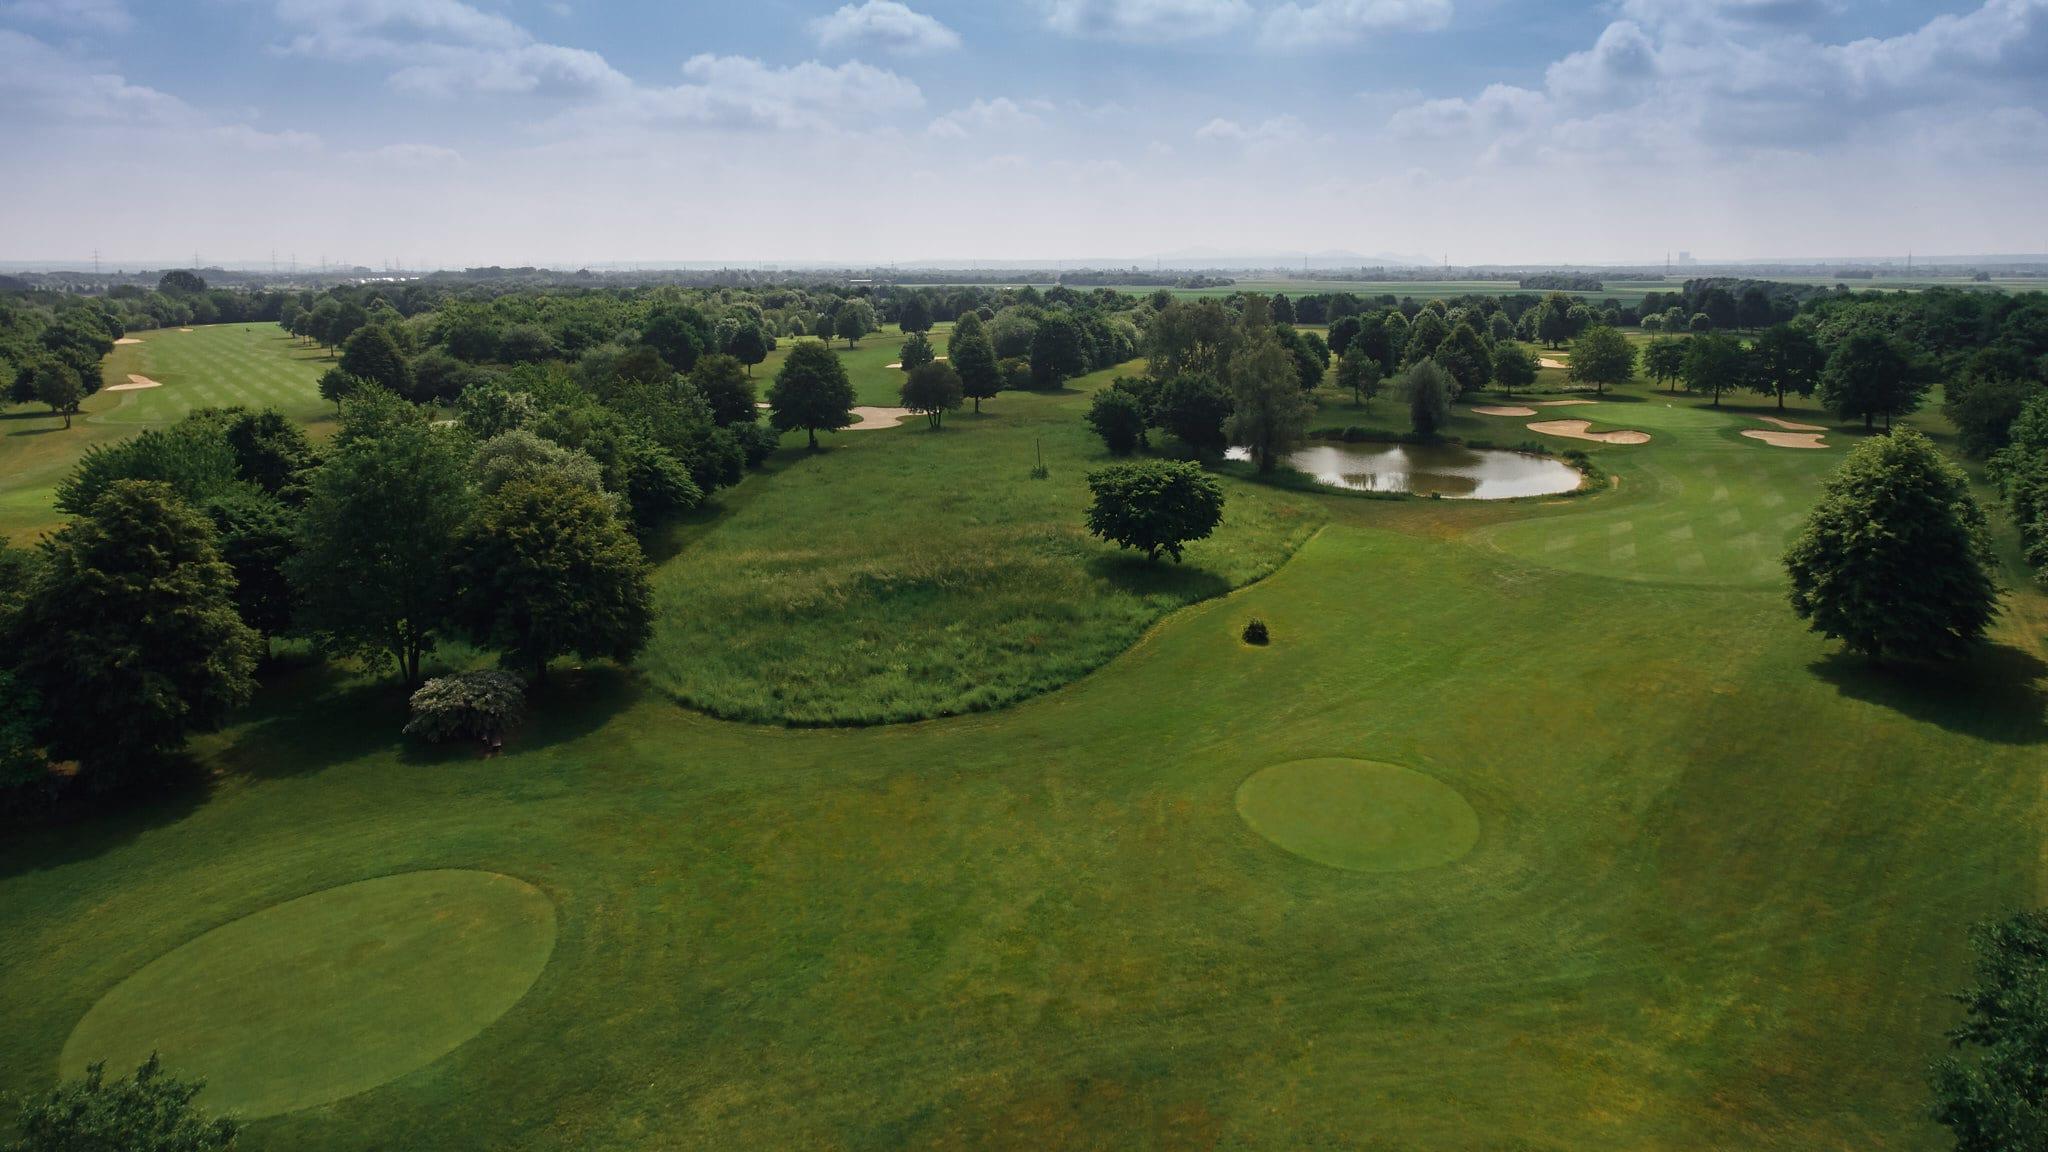 Seen auf dem Grün des Golfclubs Clostermannshof.